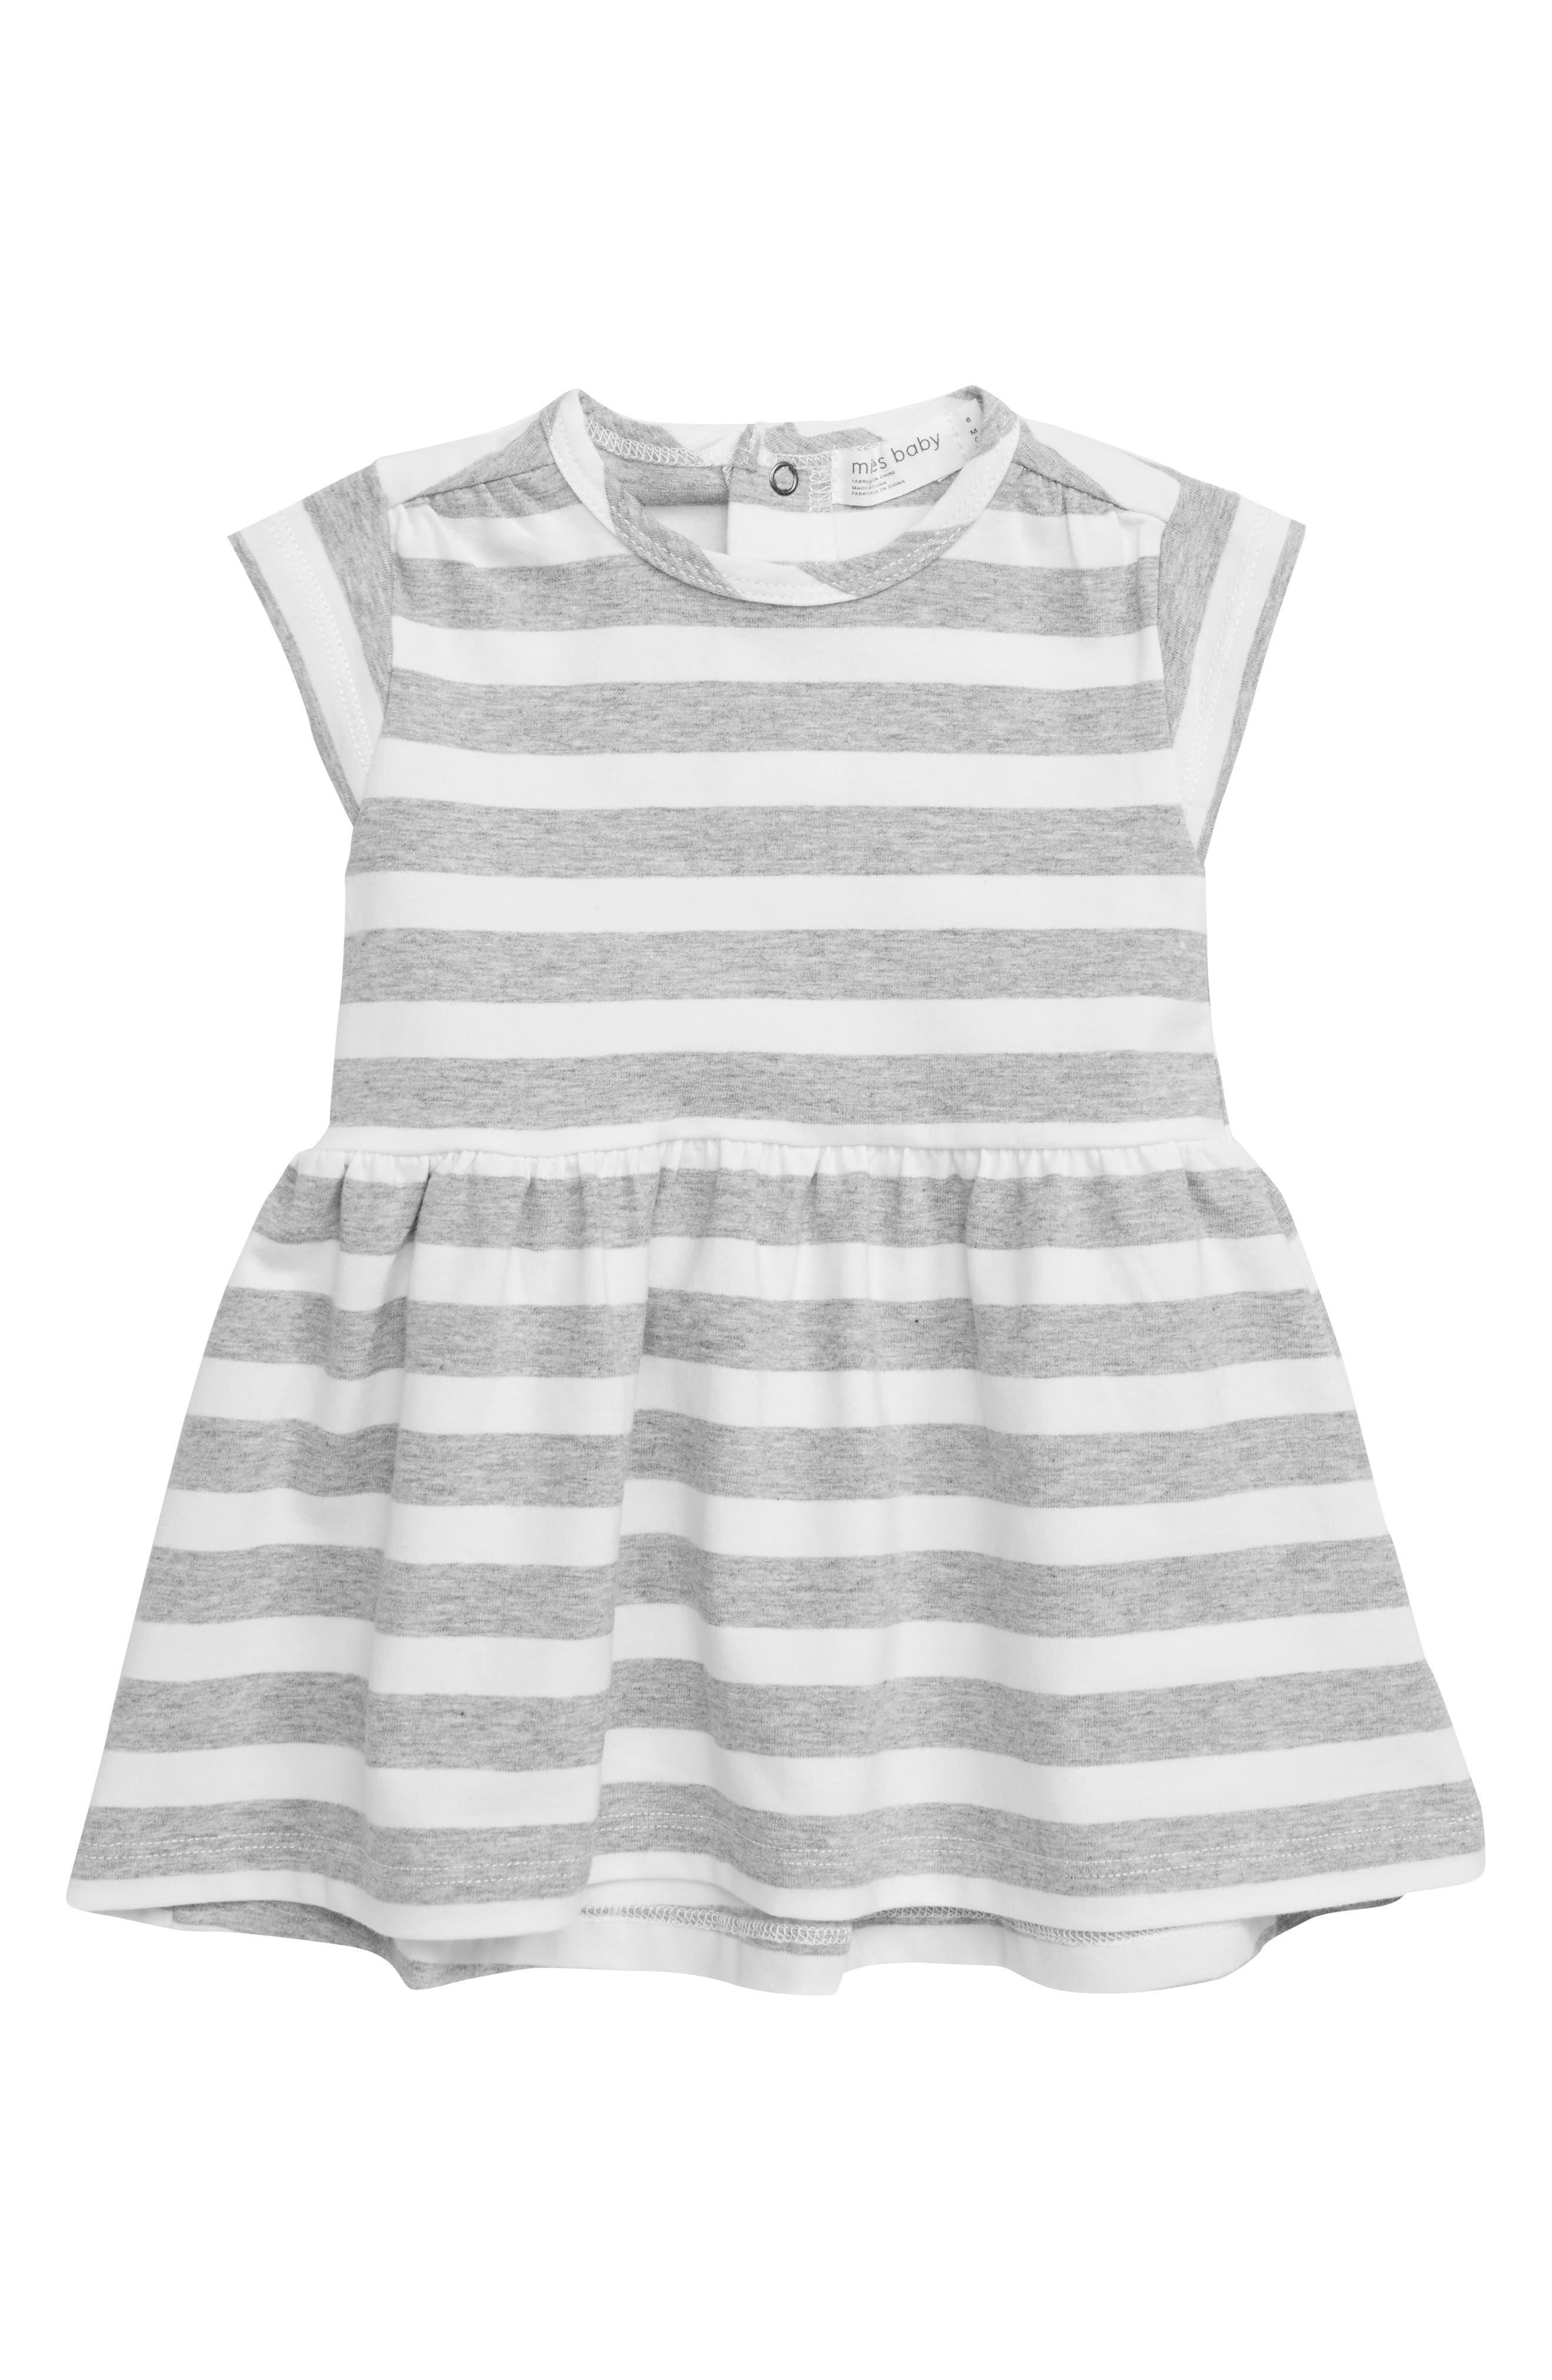 3ea4f5f9944 Miles Baby Baby Clothing